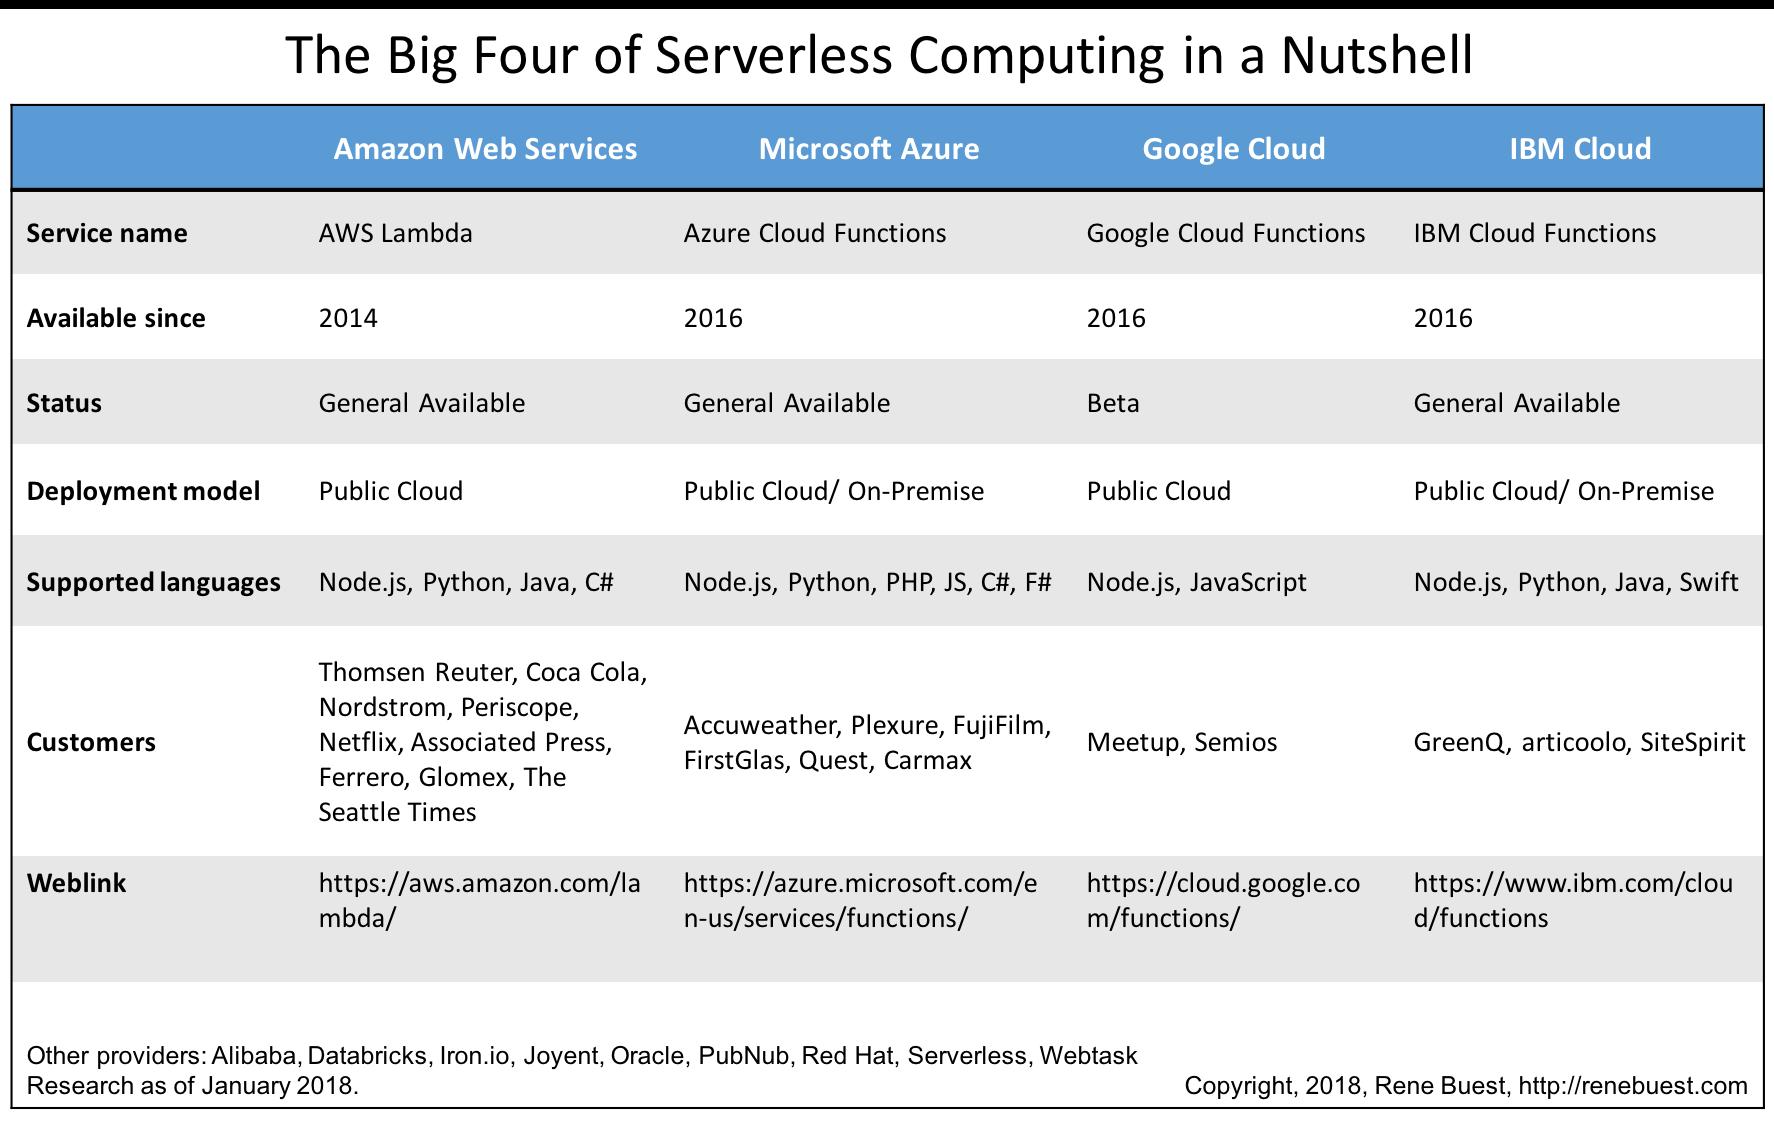 Alles über Serverless Computing